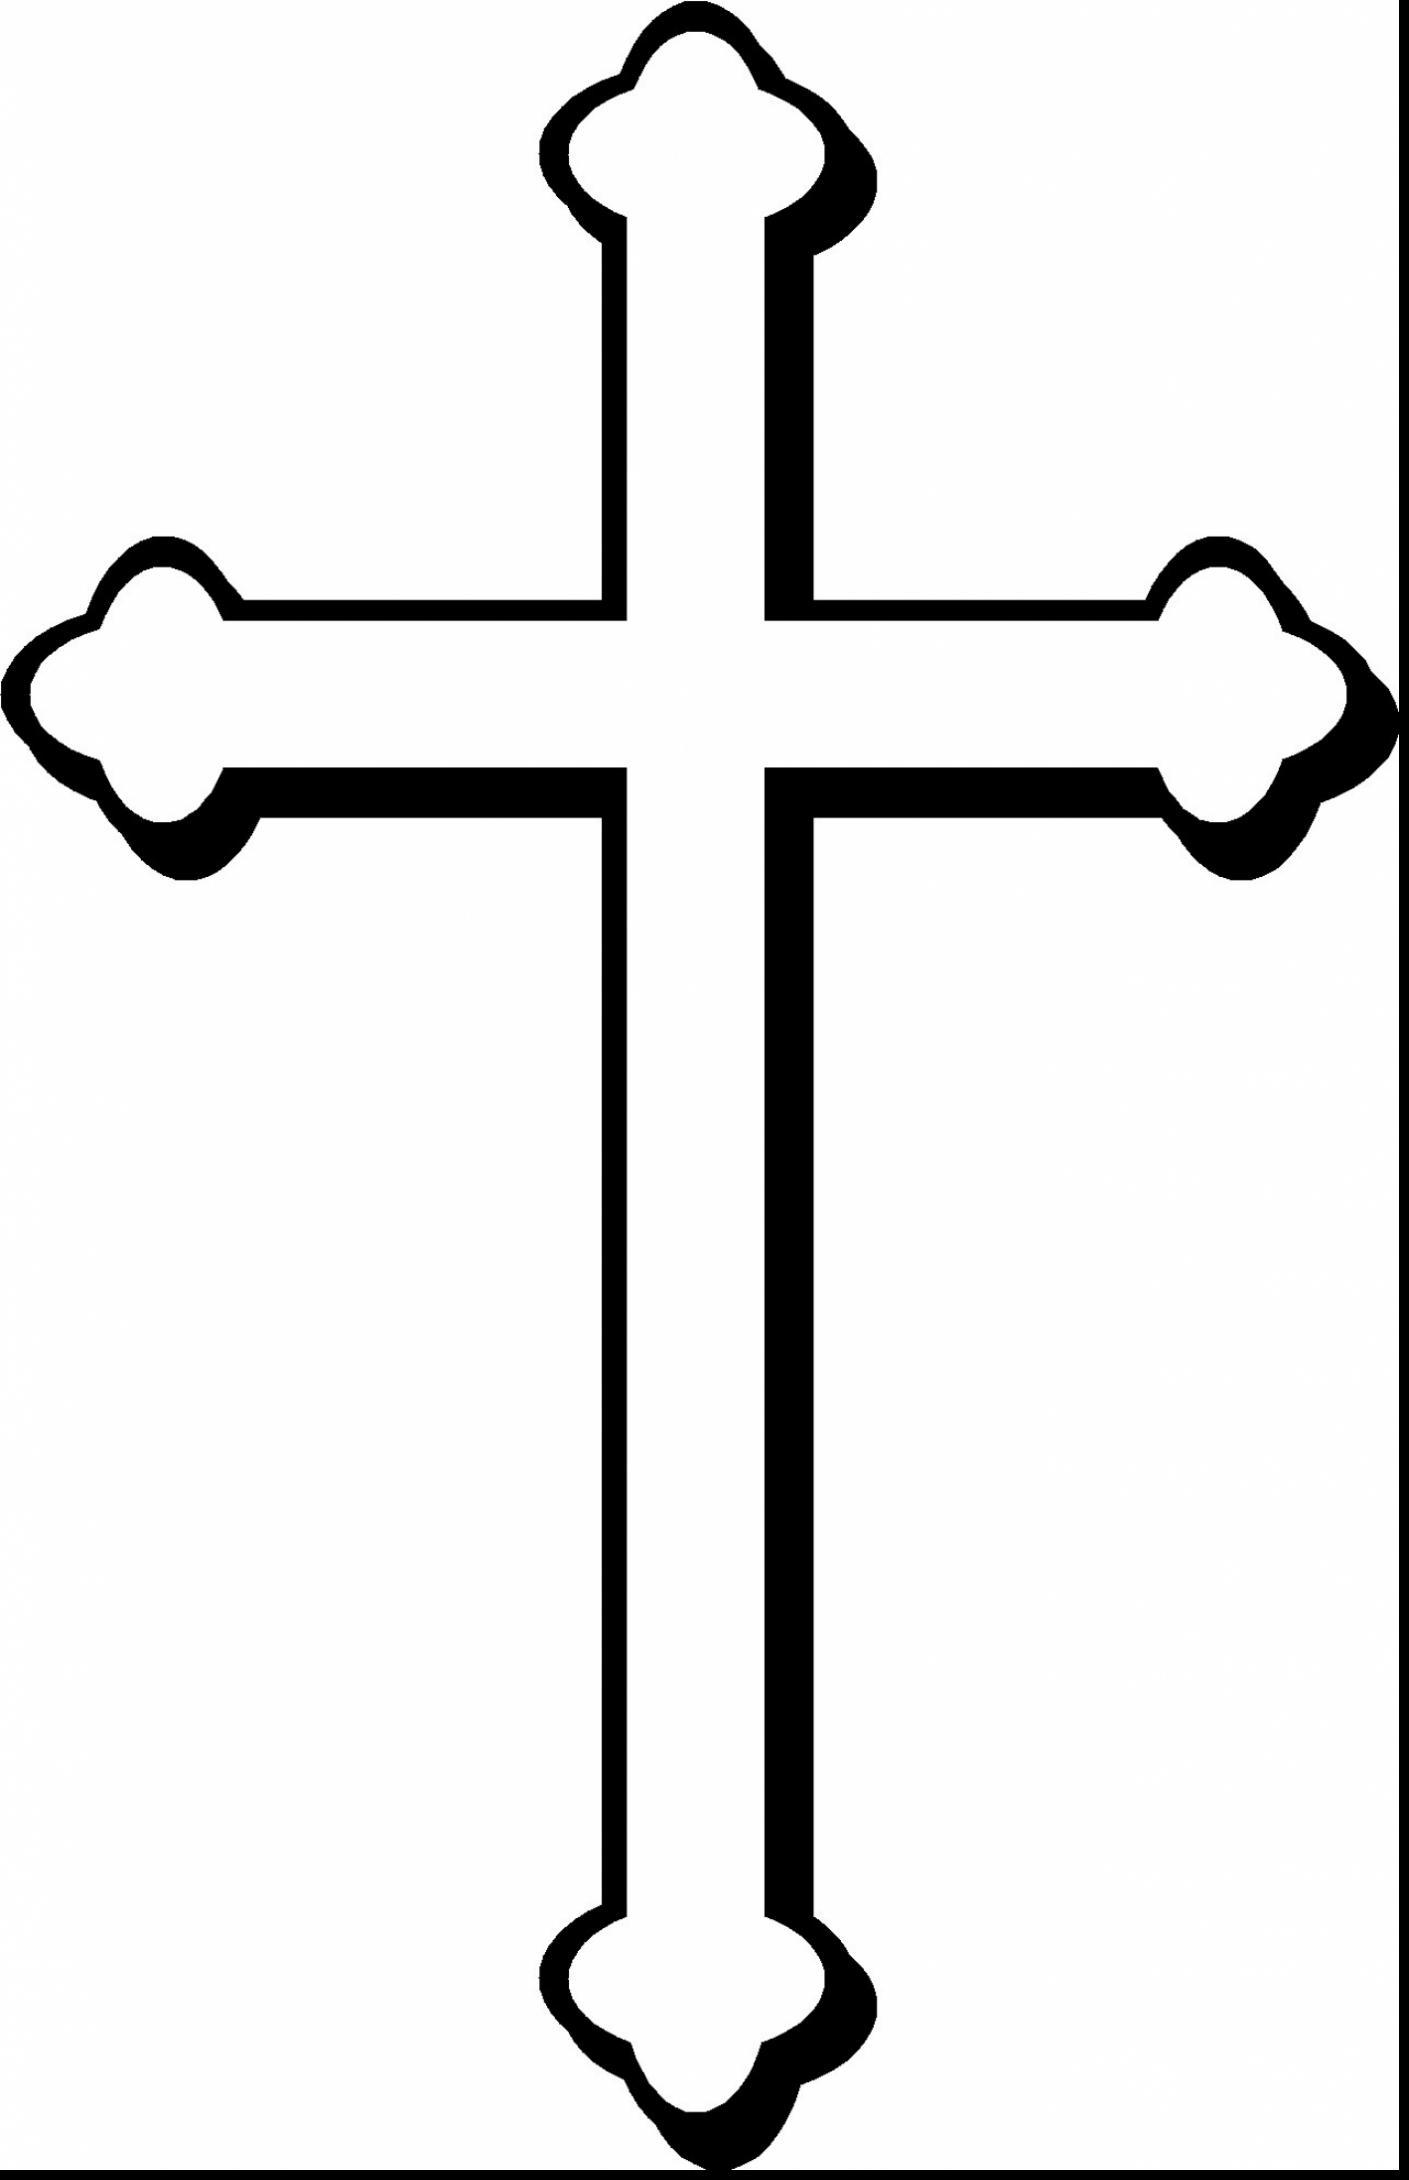 1409x2180 Fantastic Christian Cross Symbols Clip Art With Cross Coloring